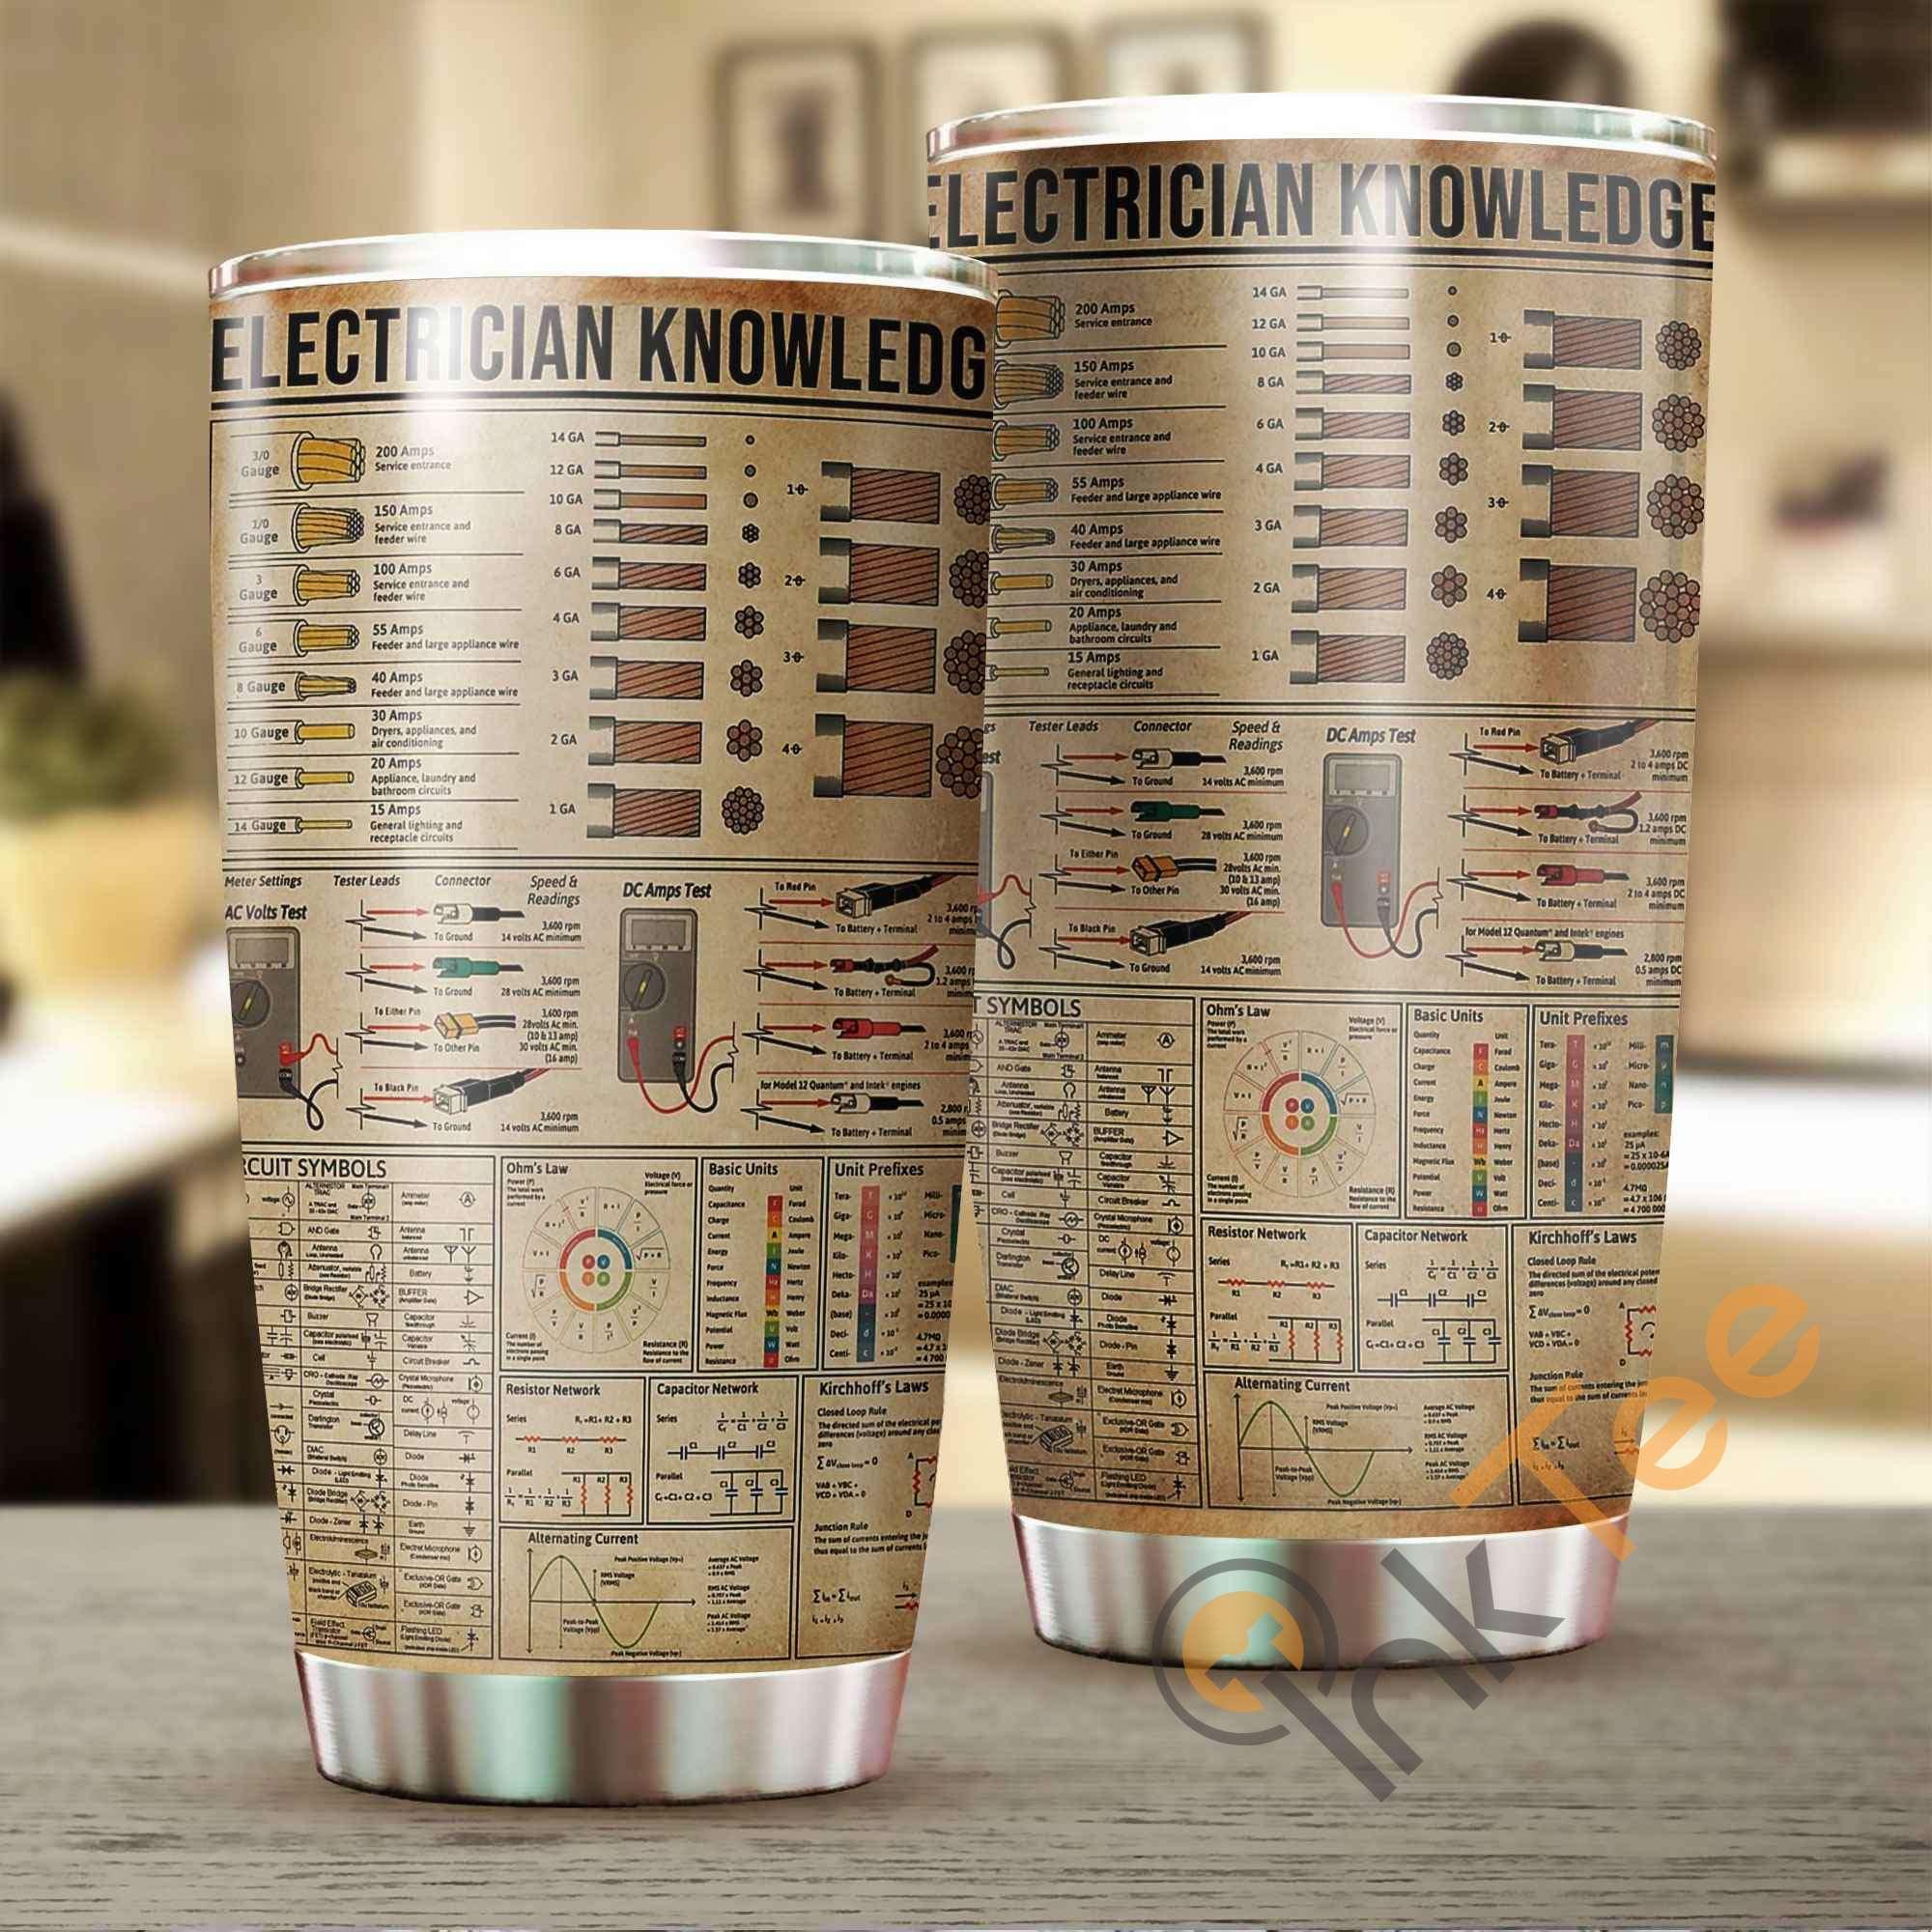 Electrician Knowledge Amazon Best Seller Sku 3017 Stainless Steel Tumbler